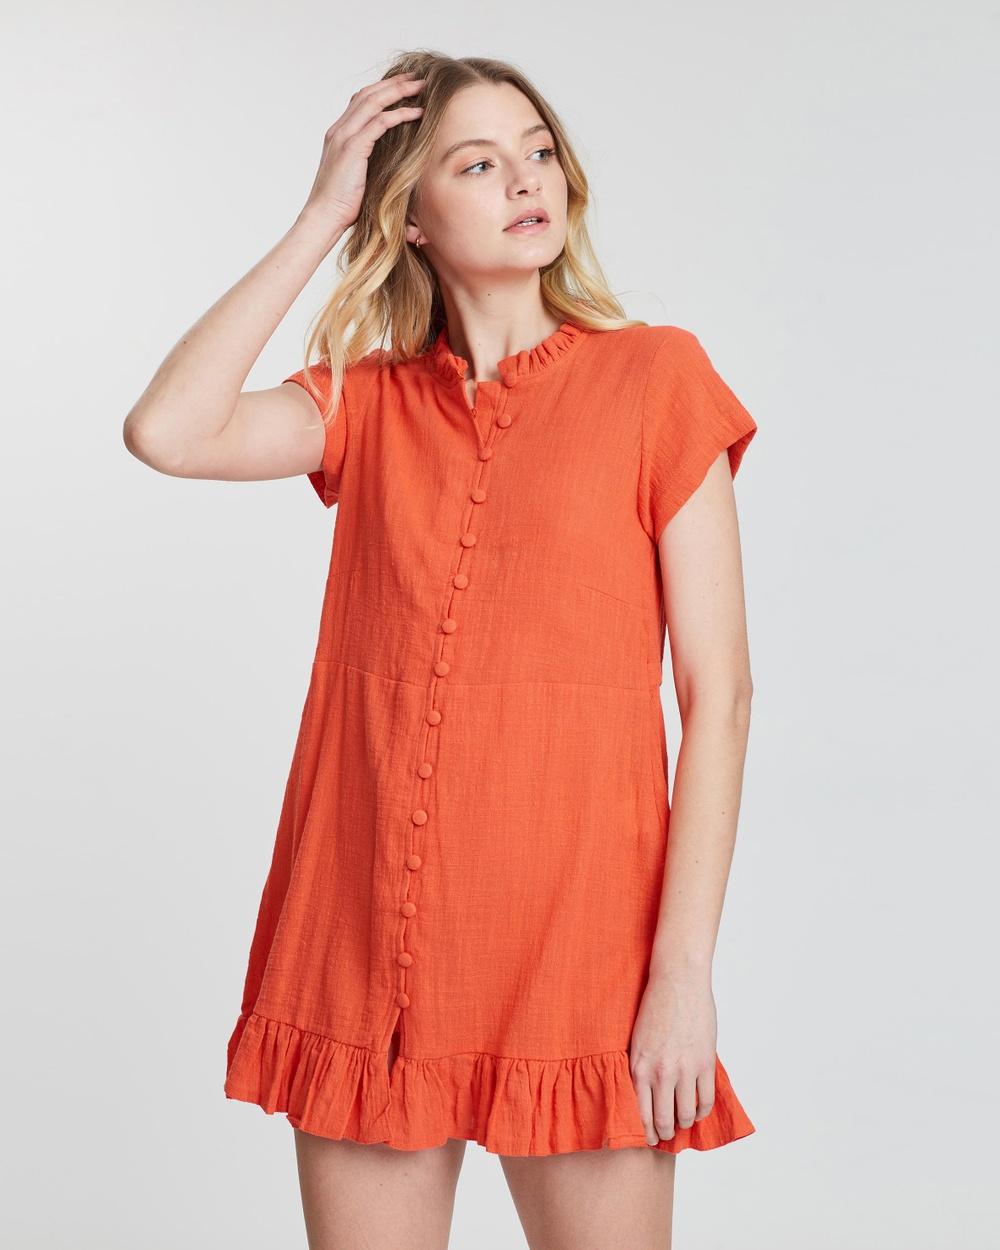 The Bare Road Aperol Ibiza Dress